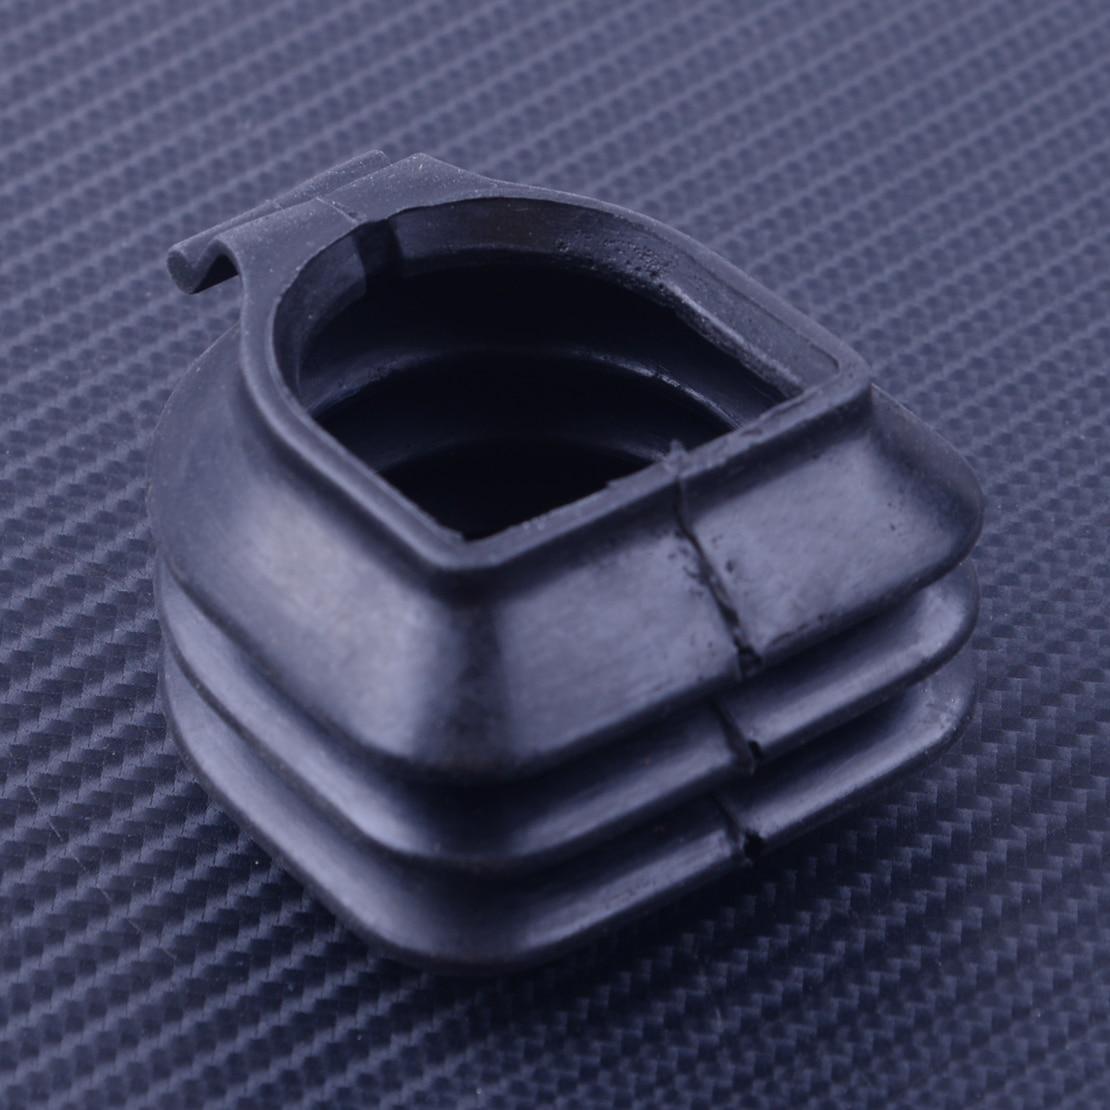 Transmission Shift Rod Selector Shaft Protective Sleeve Boot 020301261 Fit For VW Cabriolet Jetta Golf Mk1 Mk2